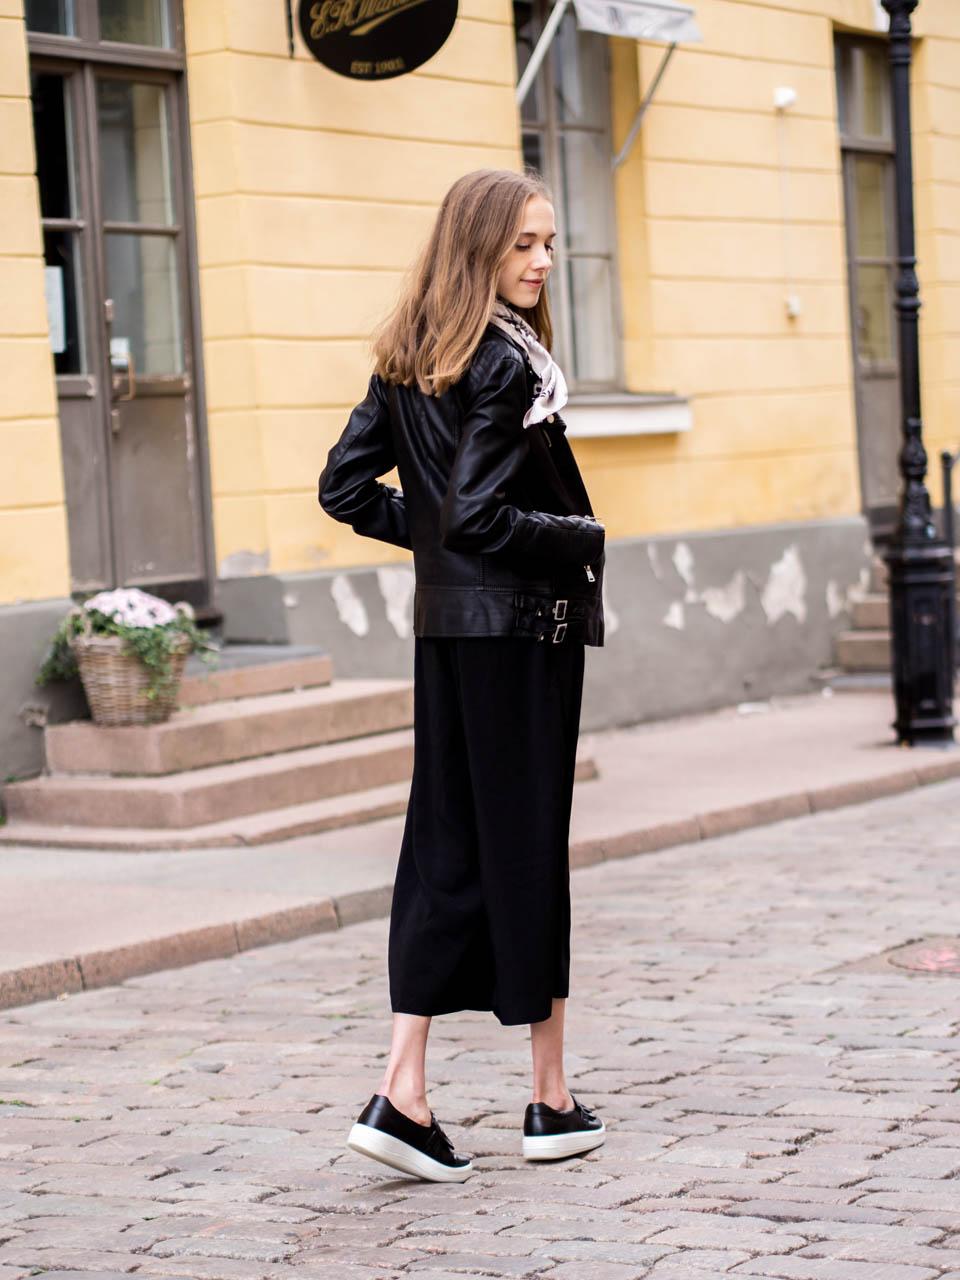 fashion-blogger-autumn-outfit-culottes-leather-jacket-leopard-print